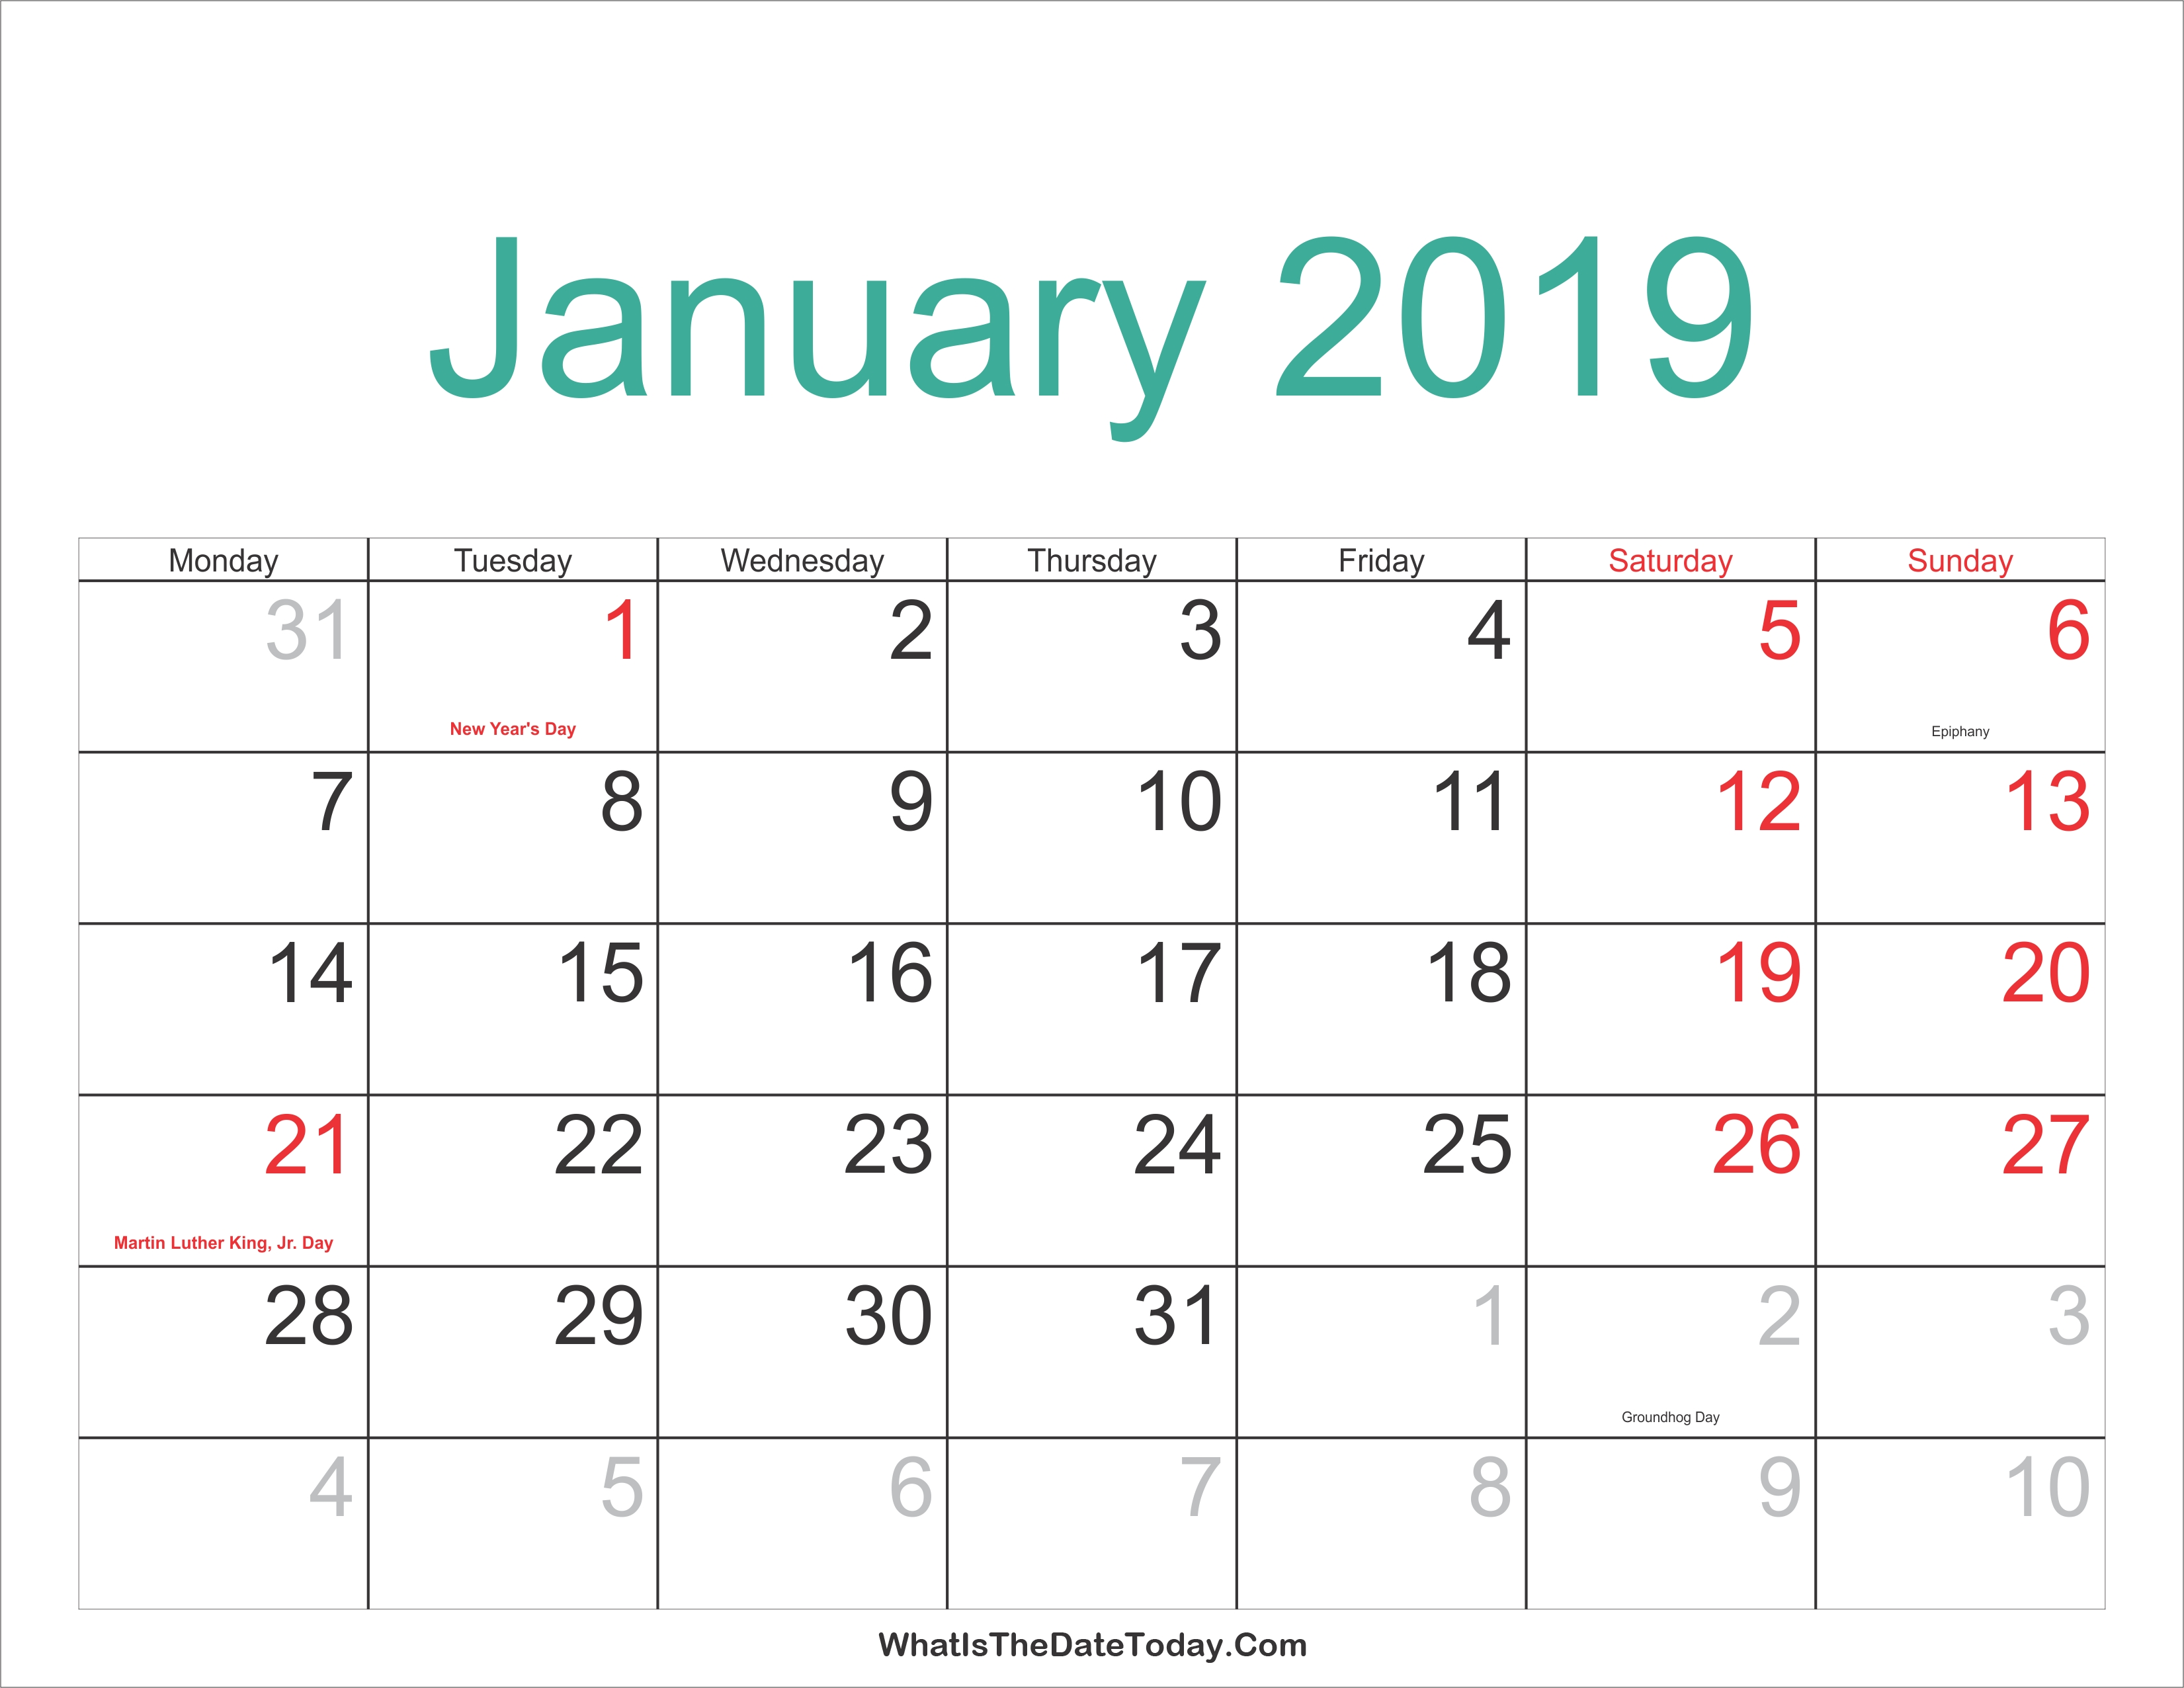 January 2019 Calendar Holidays January 5 2019 Calendar